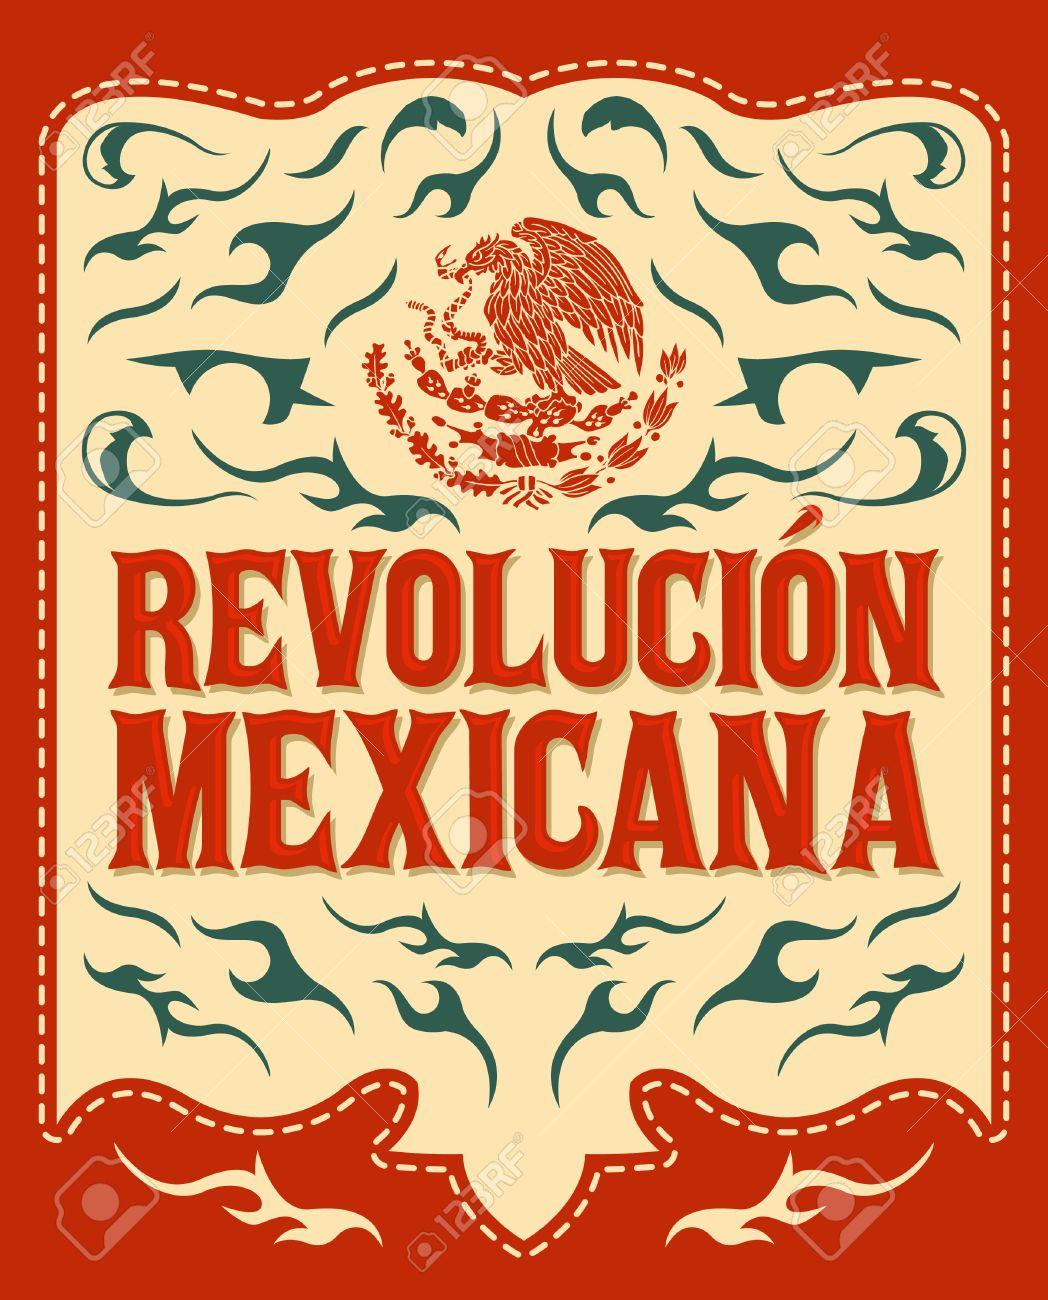 Revolucion Mexicana a Color Revolucion Mexicana Mexican